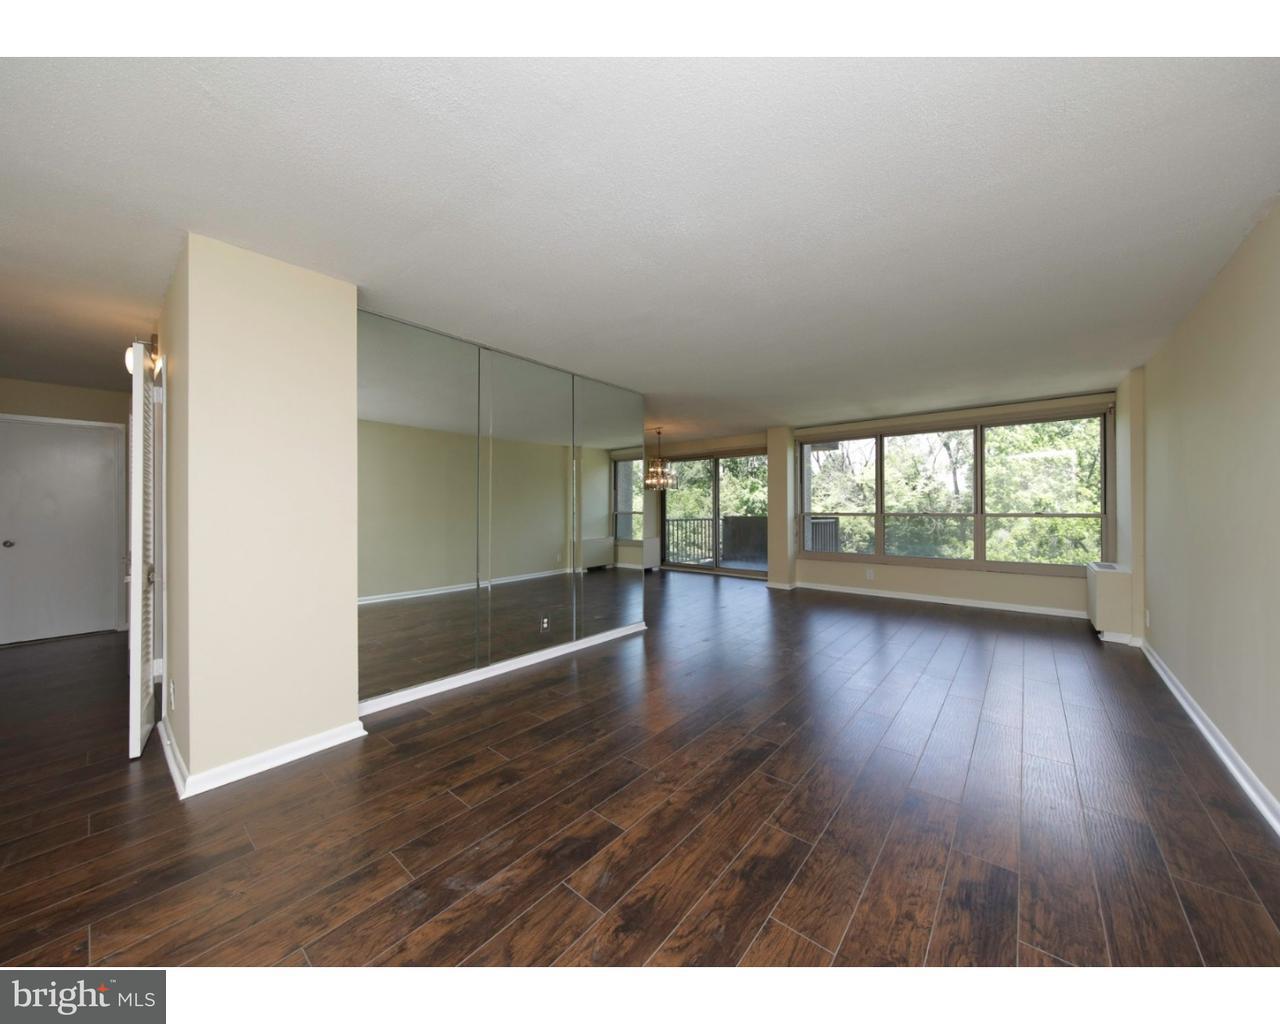 1001 City Avenue #ed514 Wynnewood , PA 19096